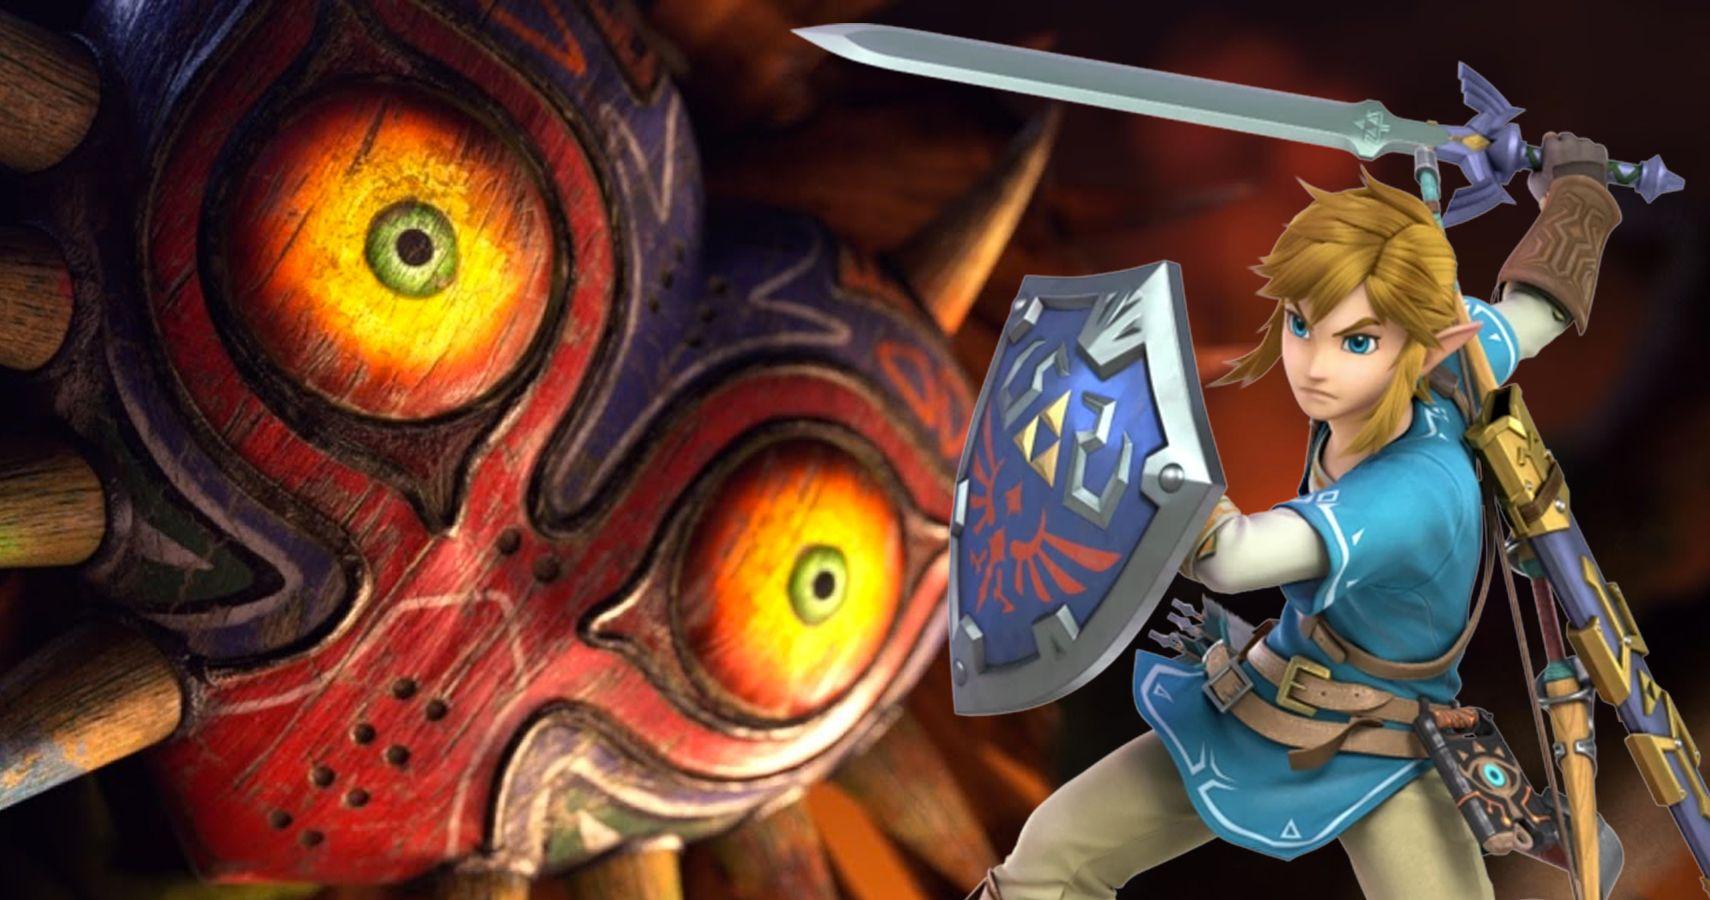 E3 2019: Breath Of The Wild's Dark Sequel Is Like Majora's Mask Following Up Ocarina